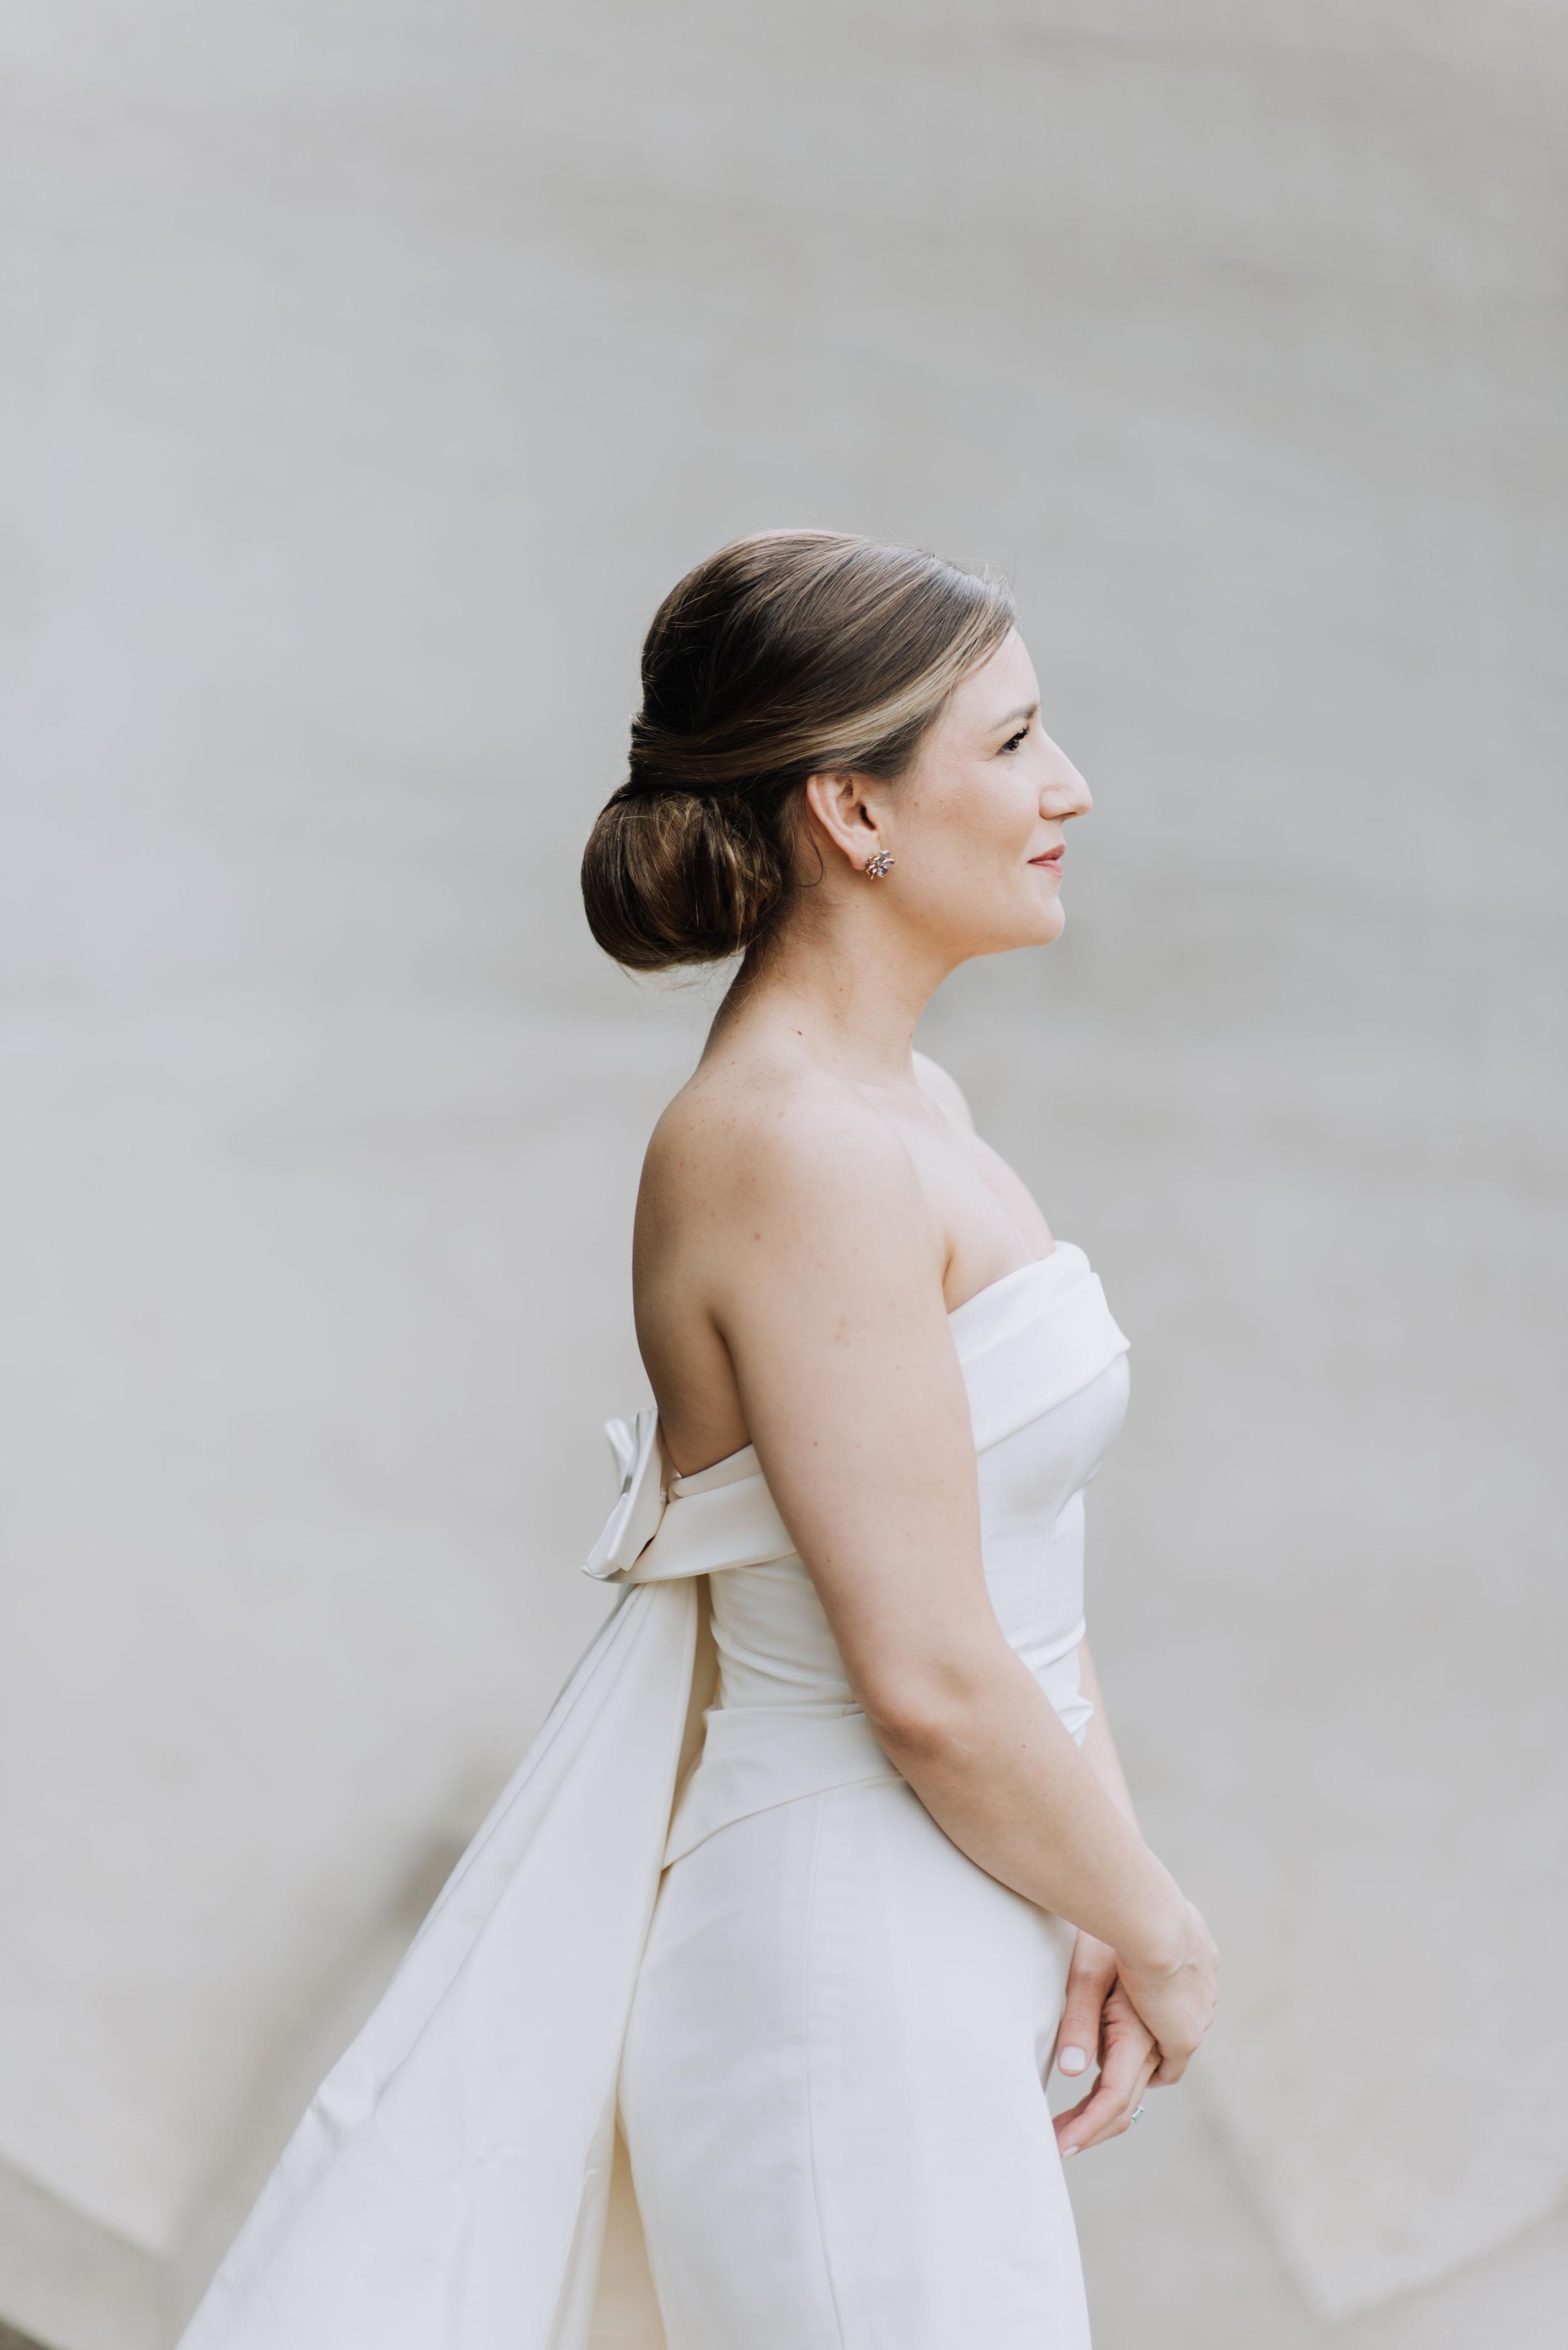 cathleen and winston wedding profile of bride